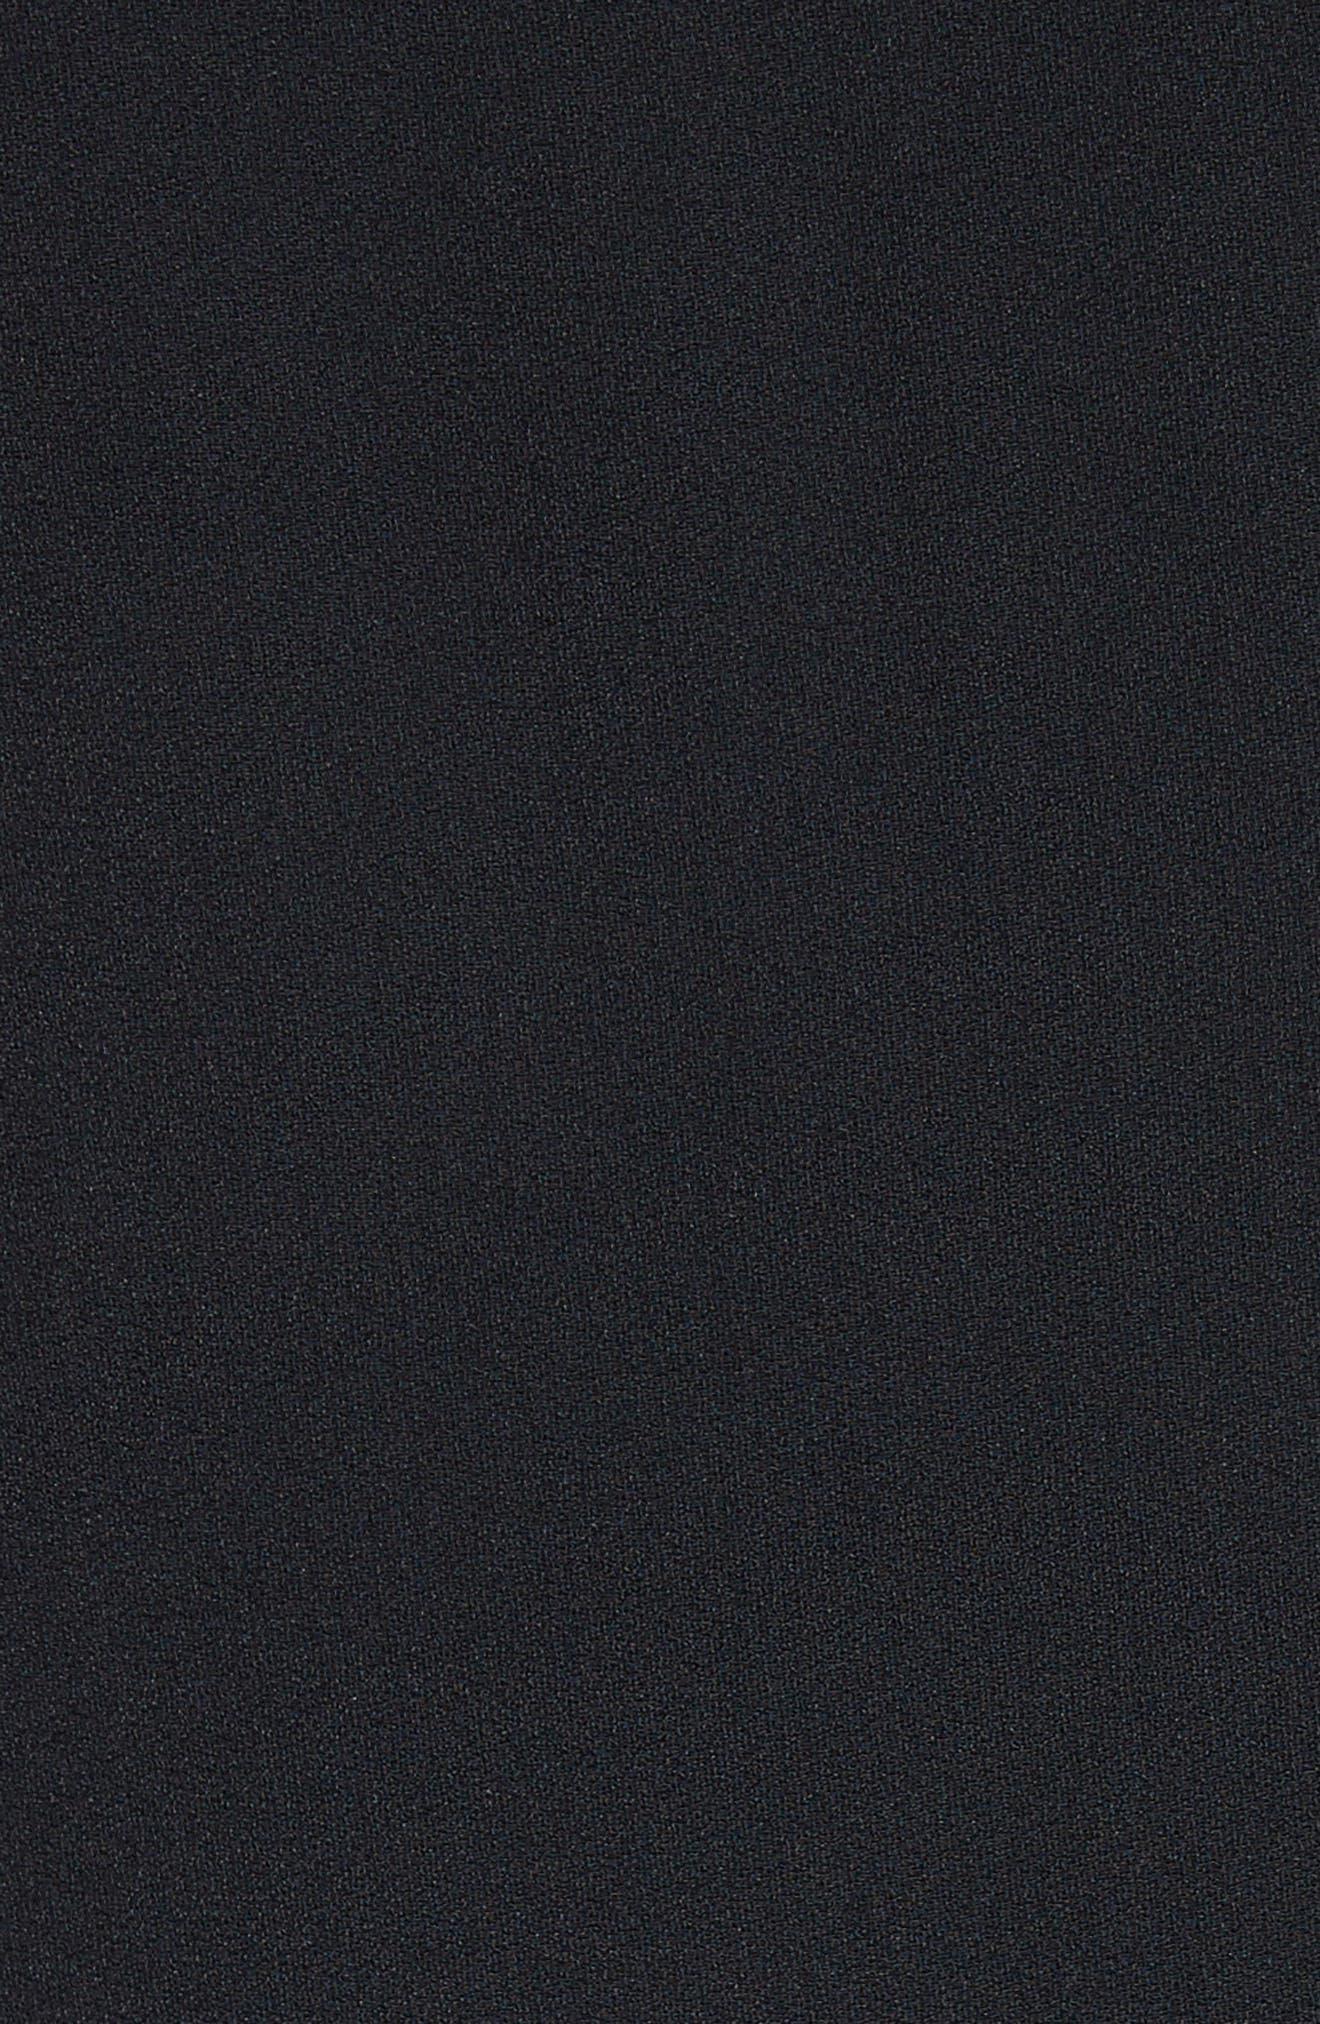 Single Shoulder Satin Back Crepe Blouse,                             Alternate thumbnail 5, color,                             Black